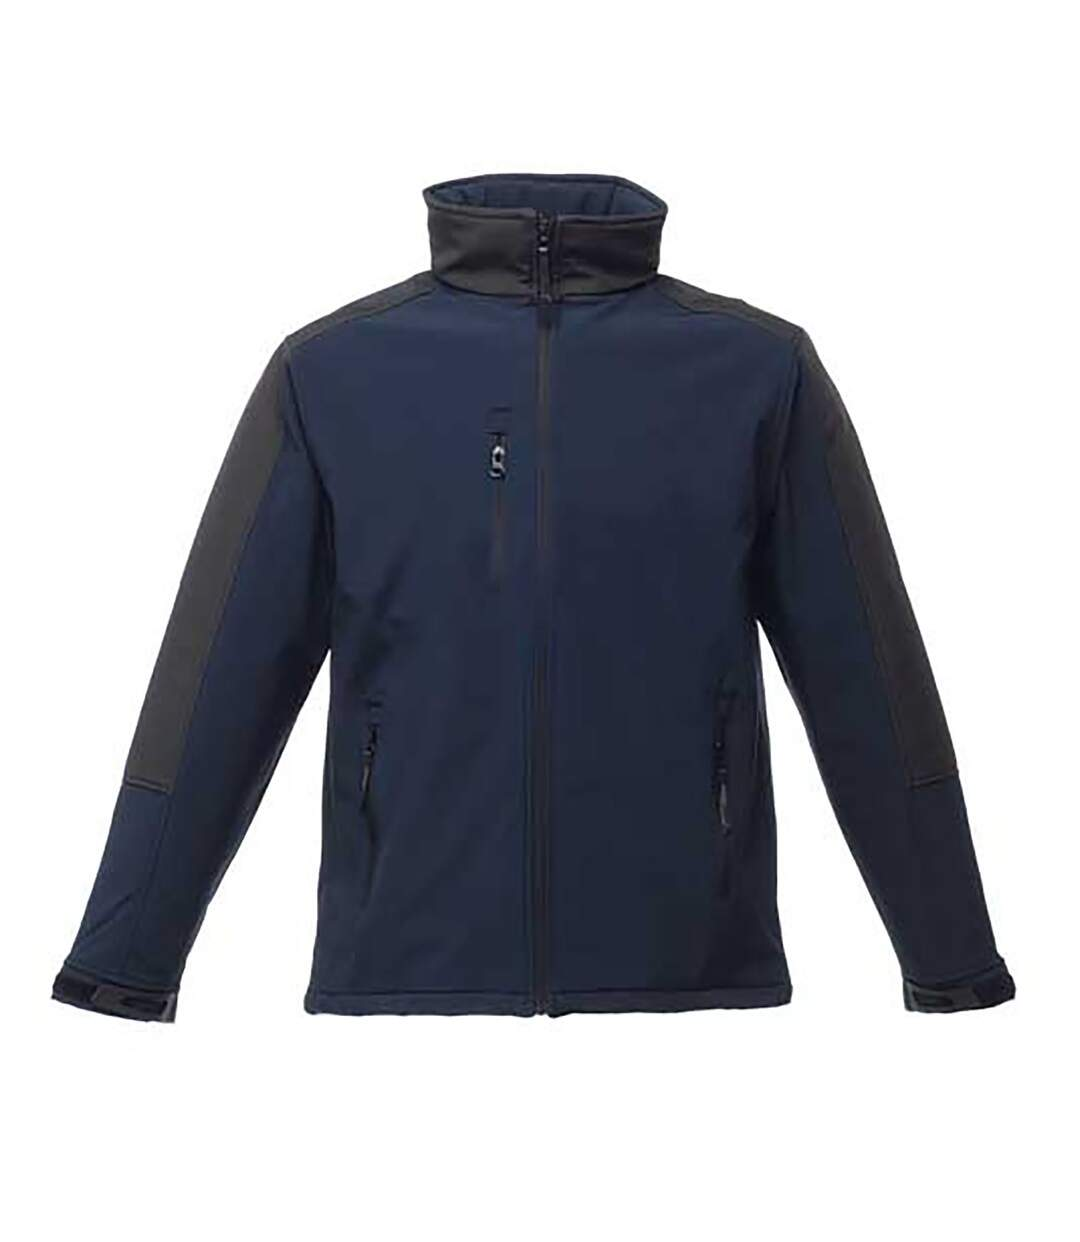 Regatta Mens Hydroforce 3-layer Membrane Waterproof Breathable Softshell Jackets (Black) - UTRG1629